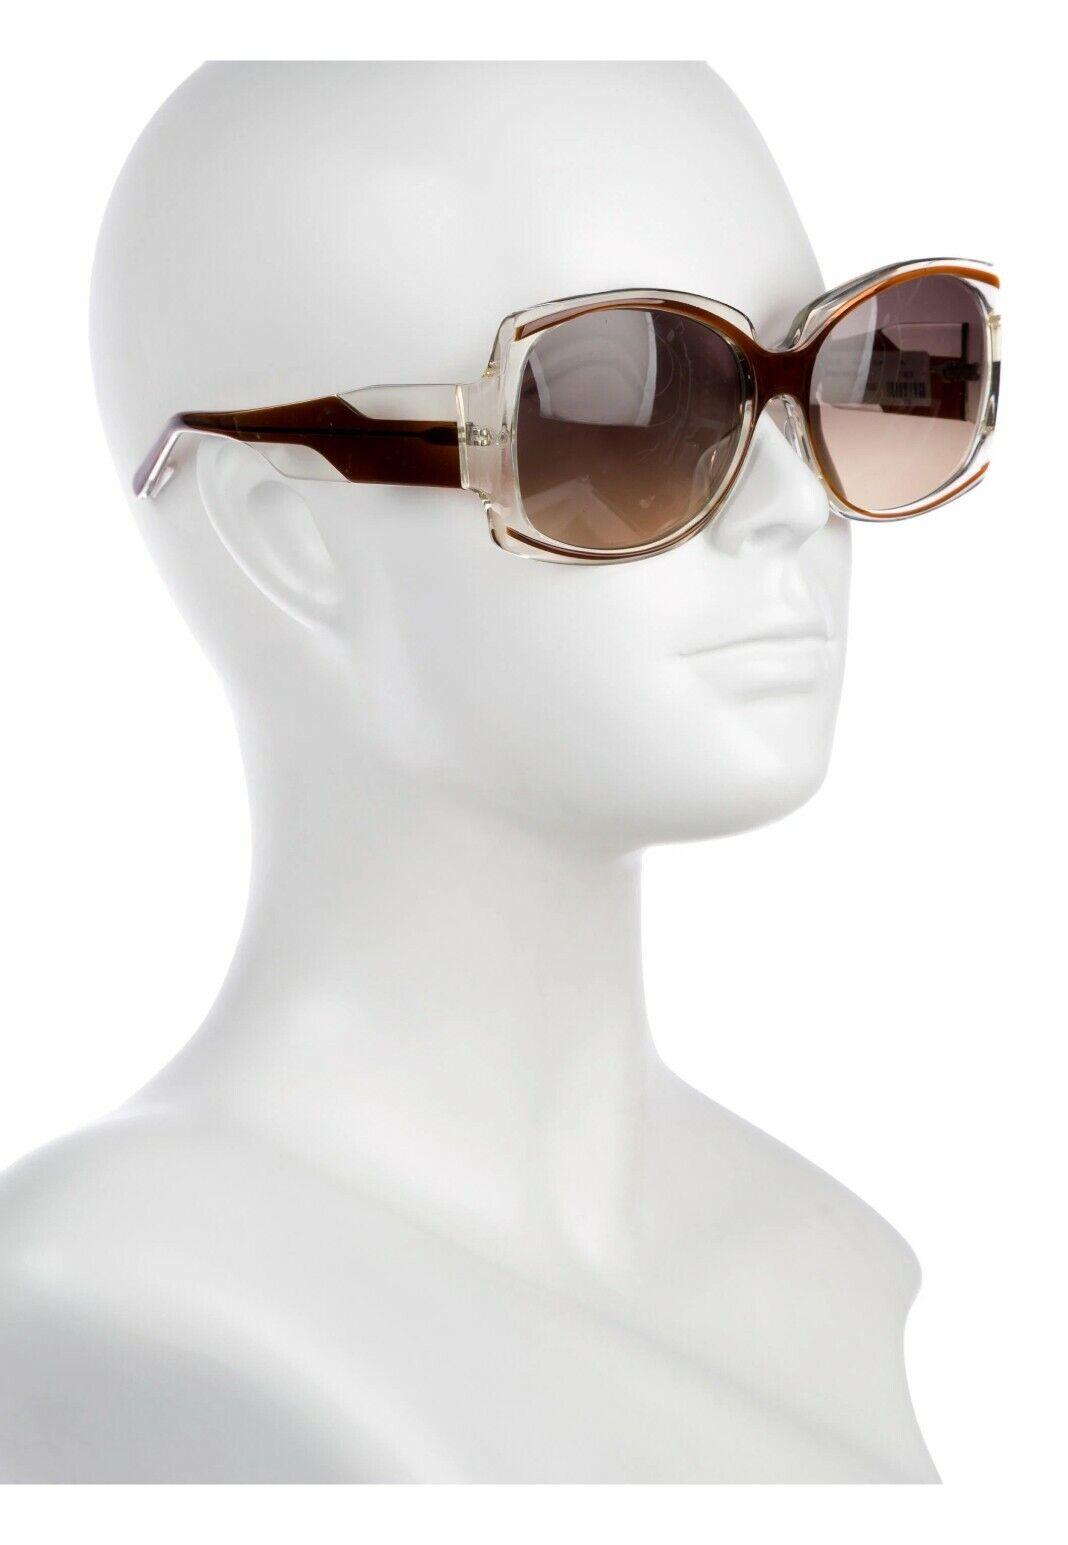 christian roth sunglasses